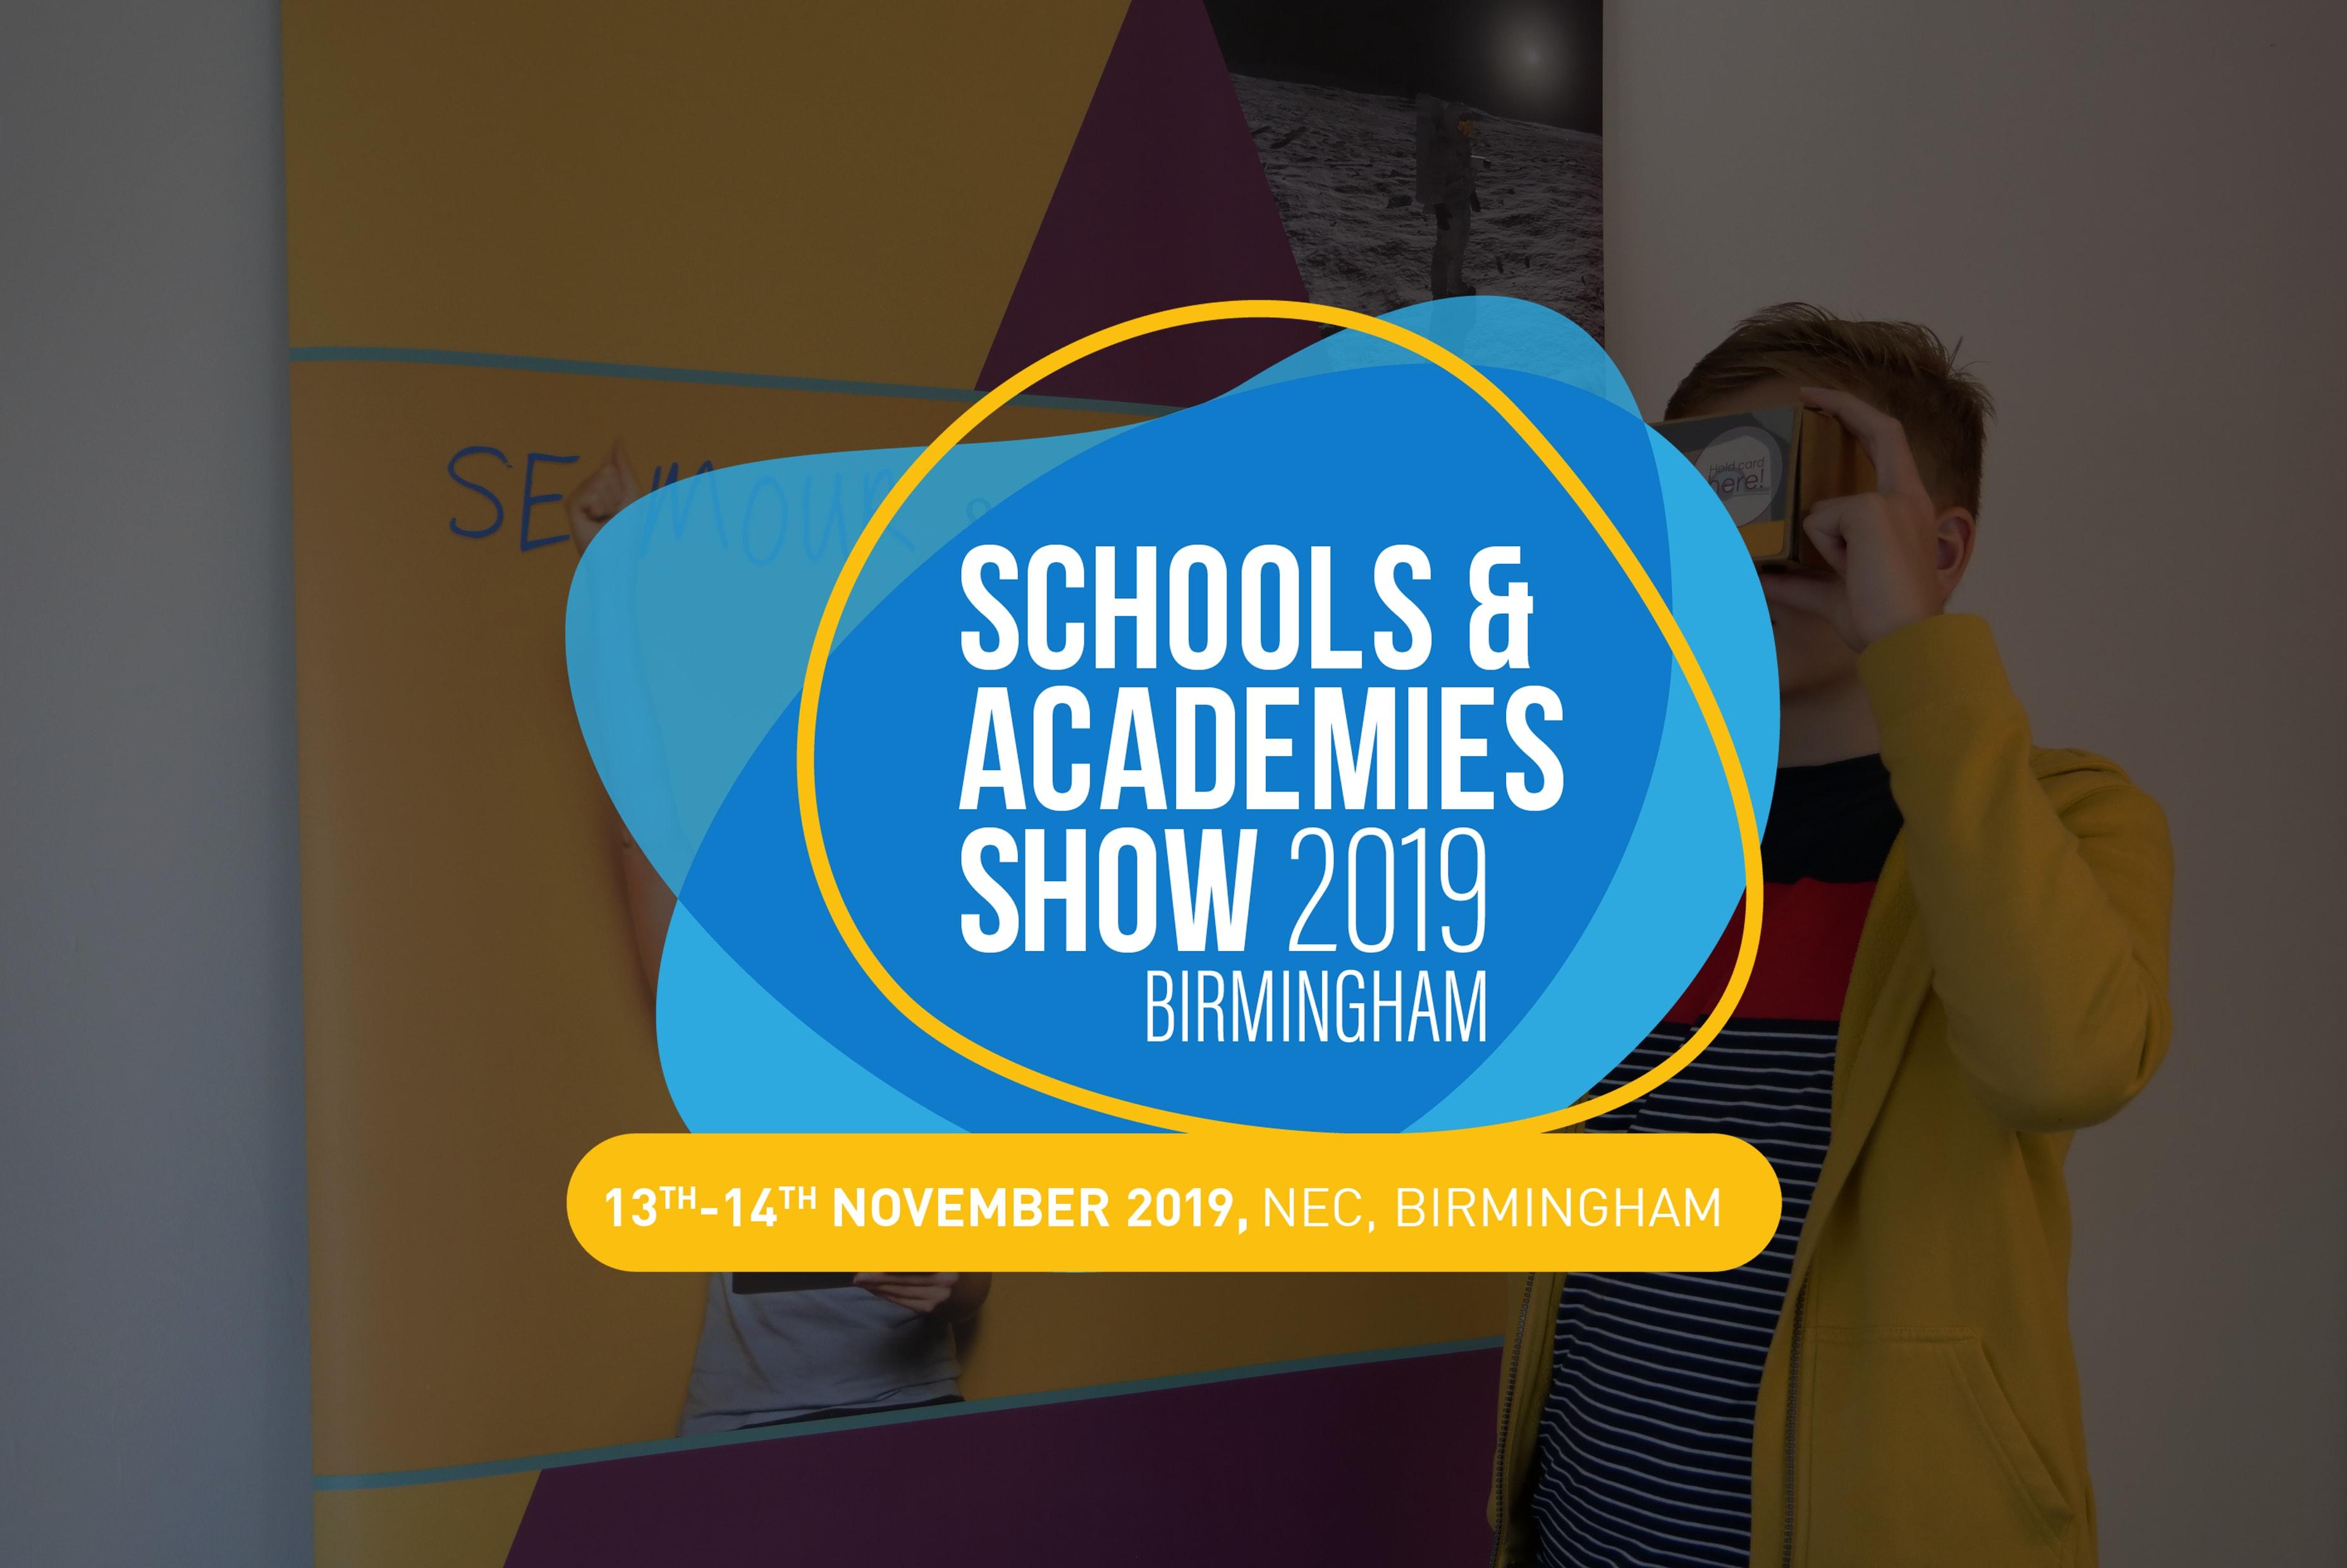 Schools and academies show